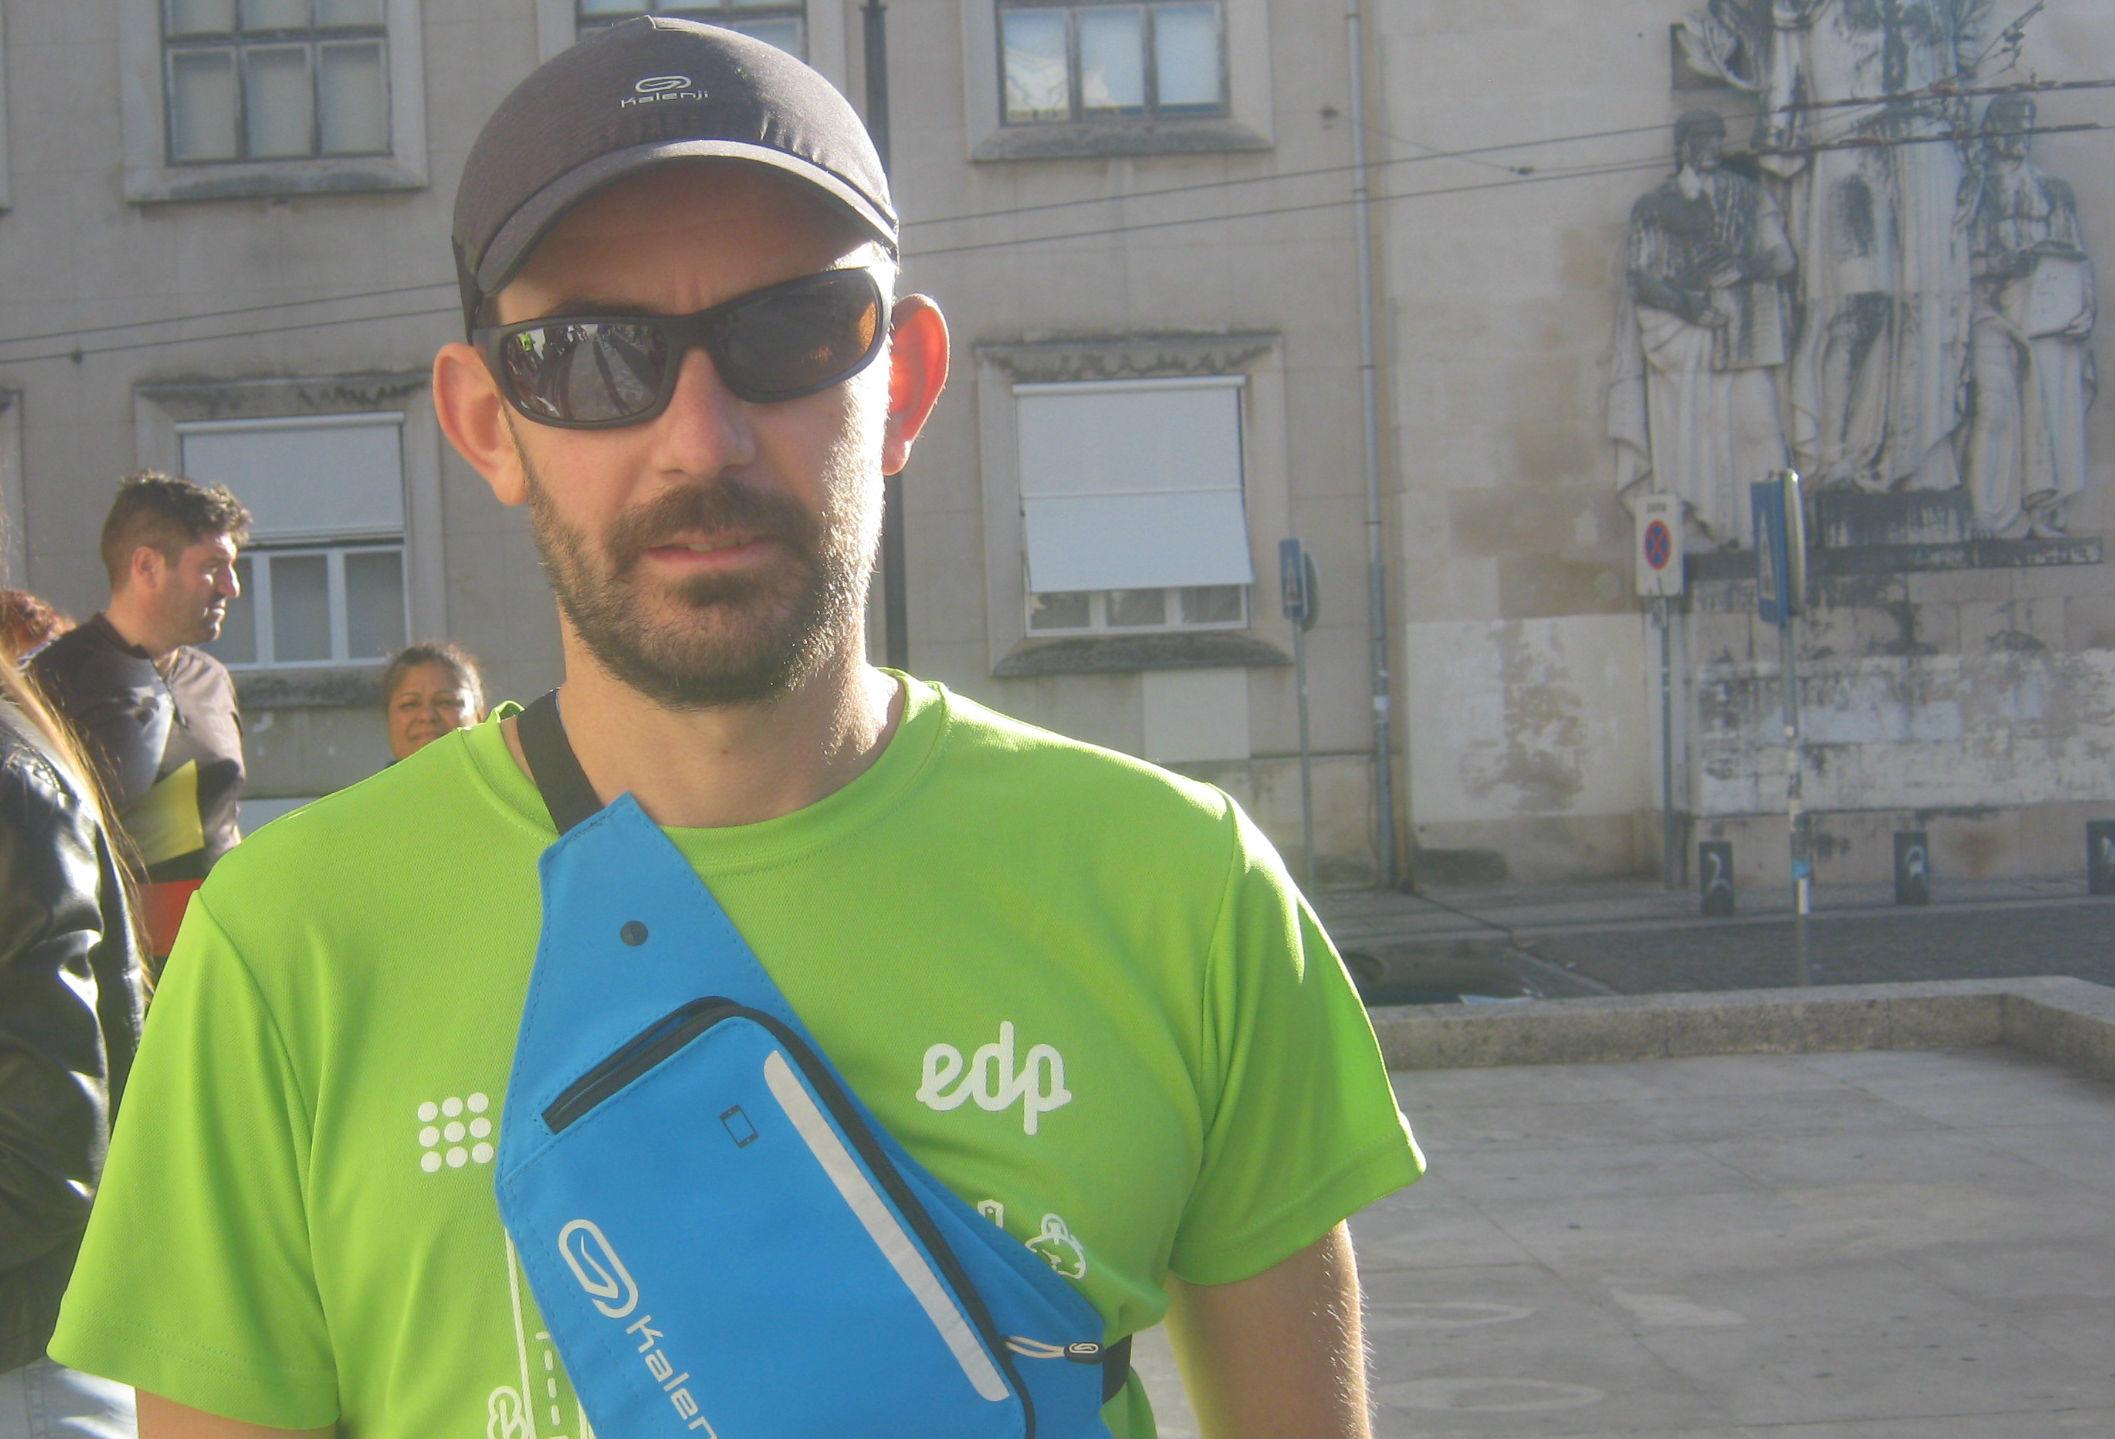 meia-maratona-coimbra2017-filipe-buco